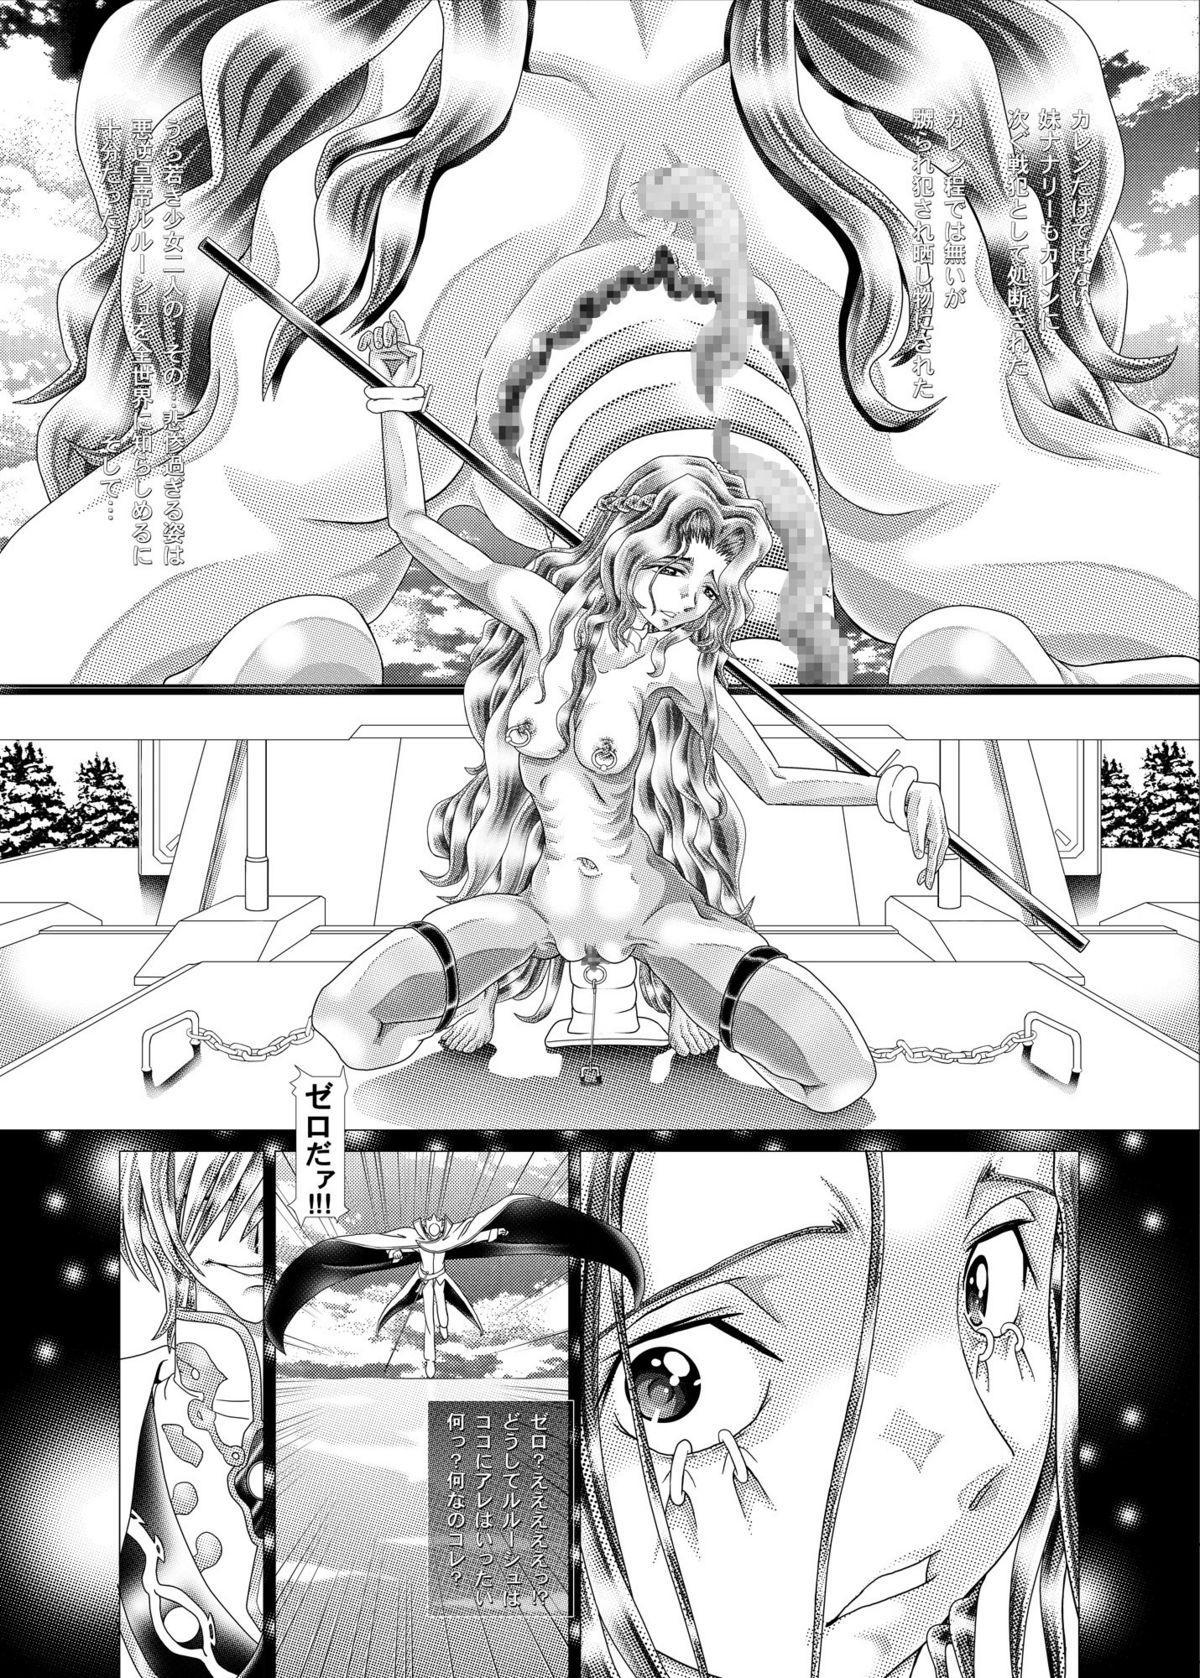 [Kaki no Boo (Kakinomoto Utamaro)] Karen - R22 of the Cord Eros - Infringement (Code Geass) [Digital] 25